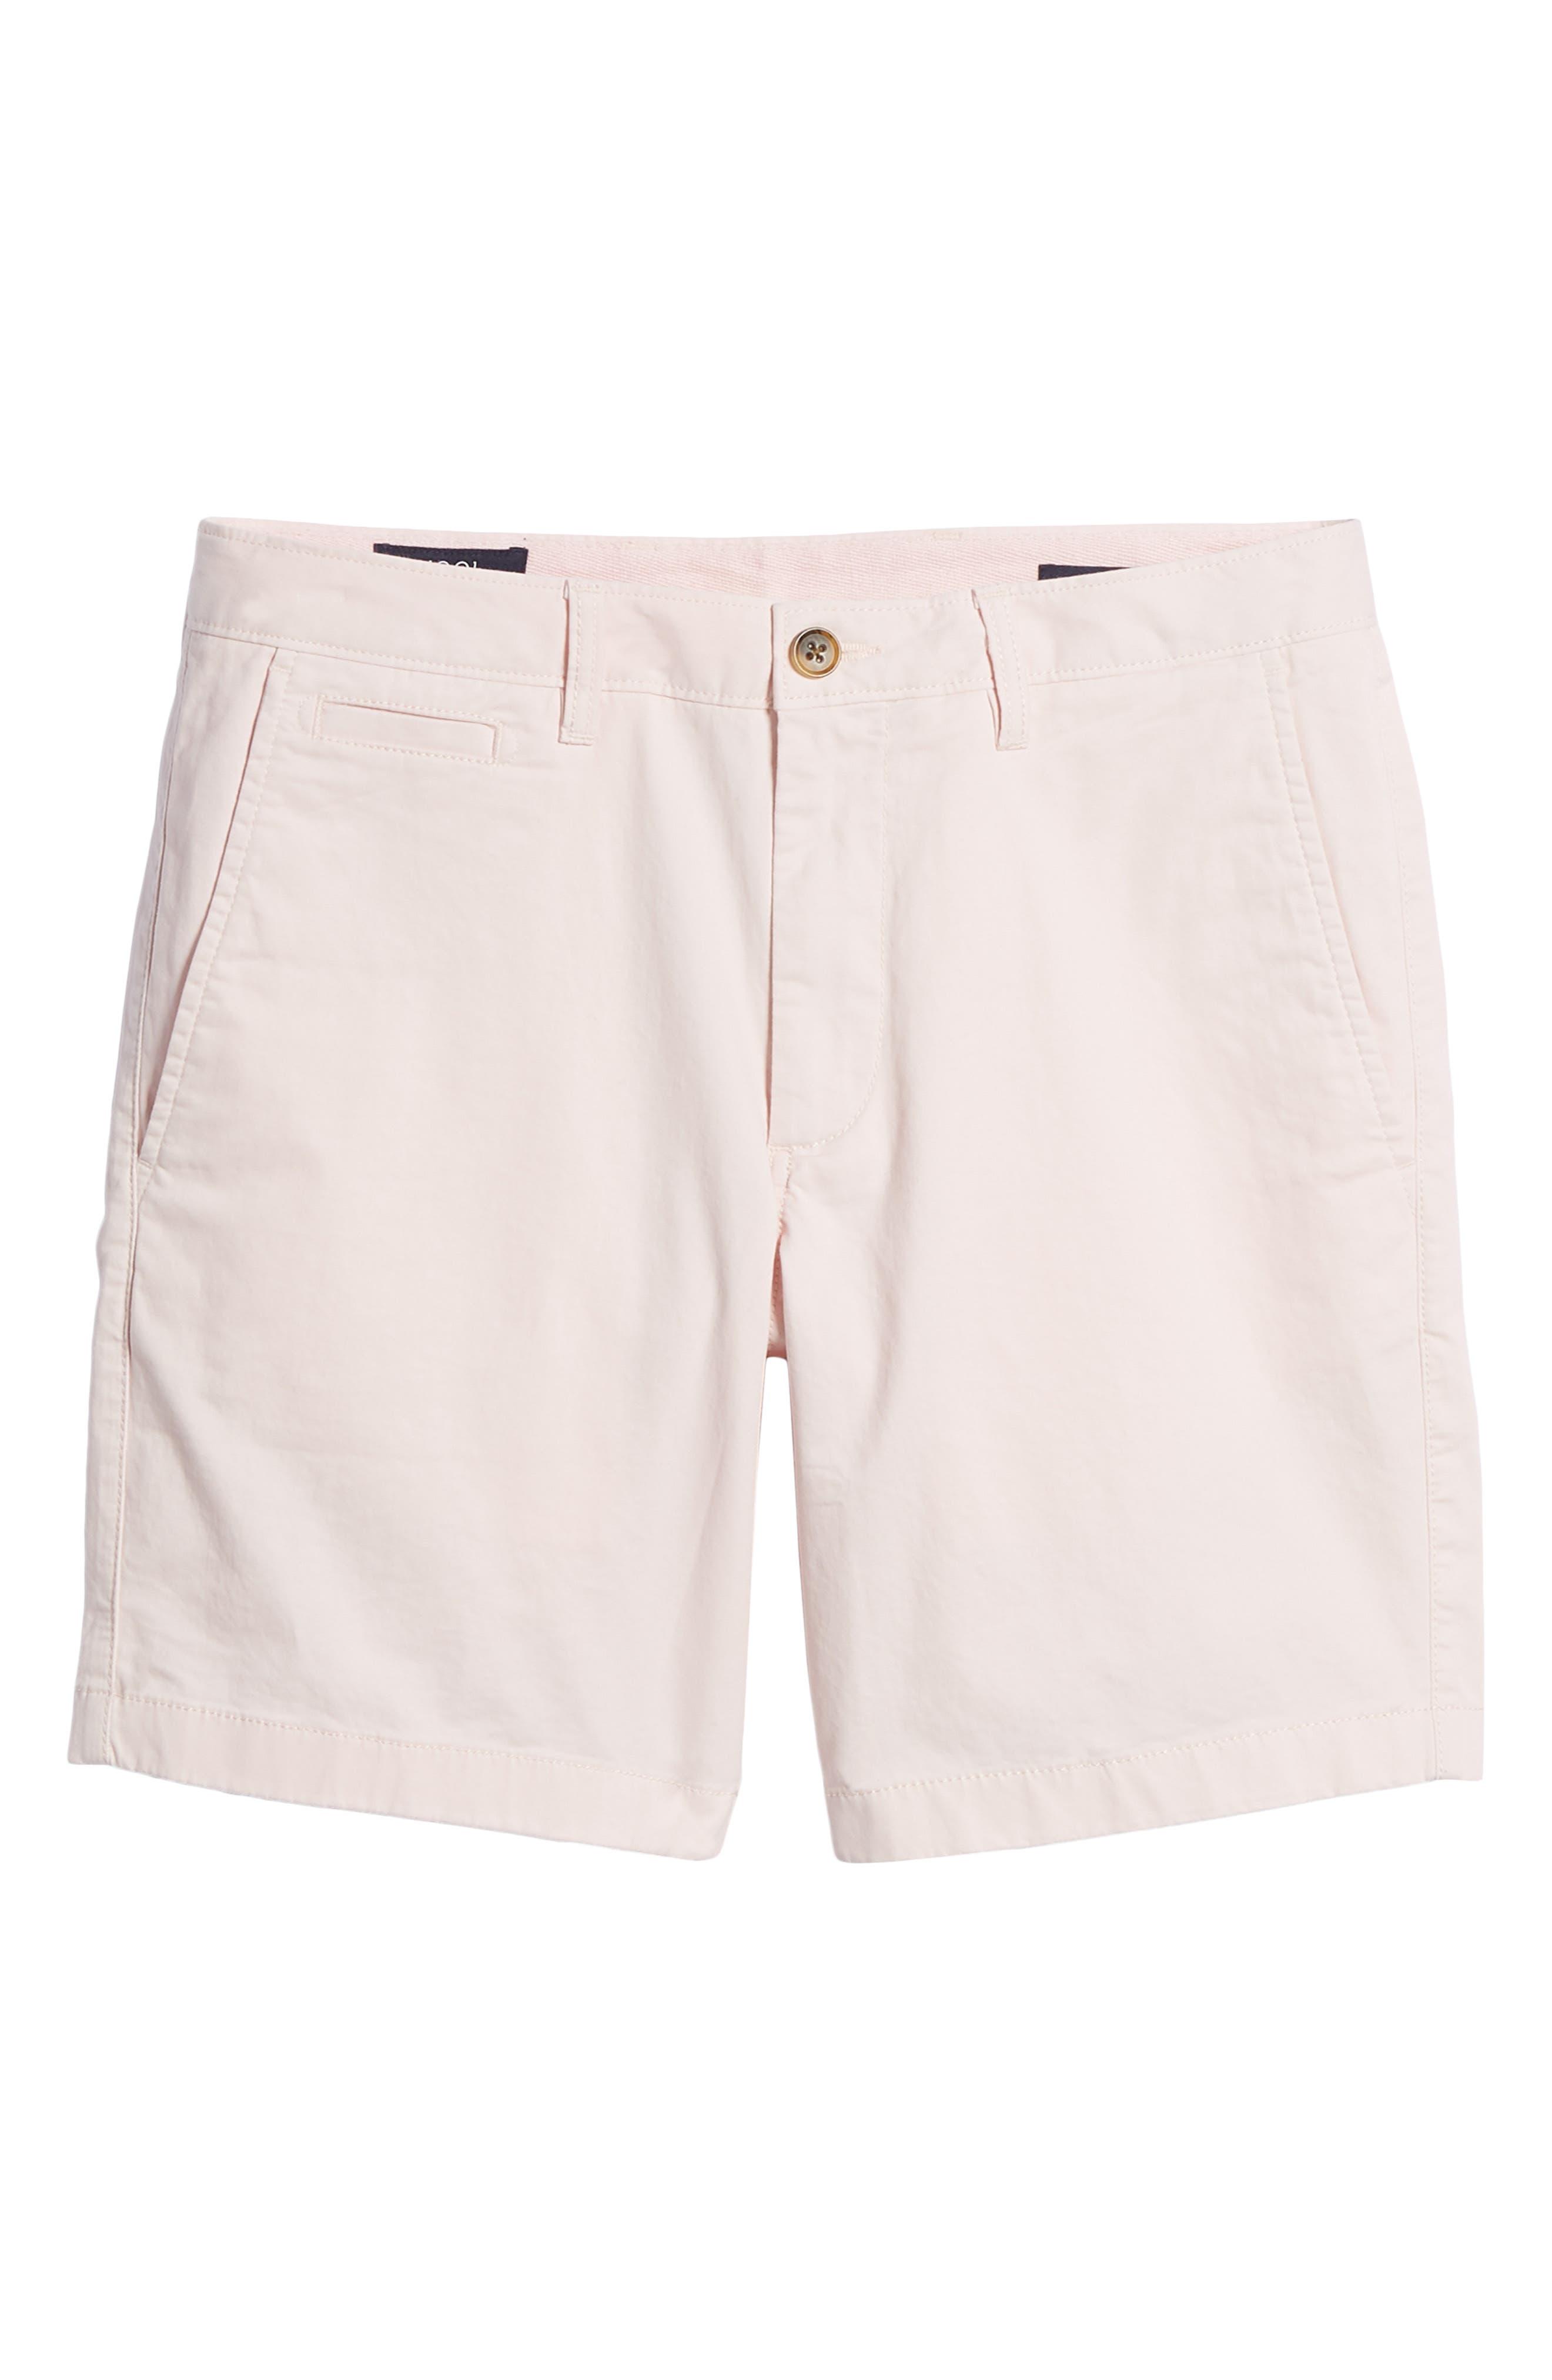 Ballard Slim Fit Stretch Chino 9-Inch Shorts,                             Alternate thumbnail 72, color,